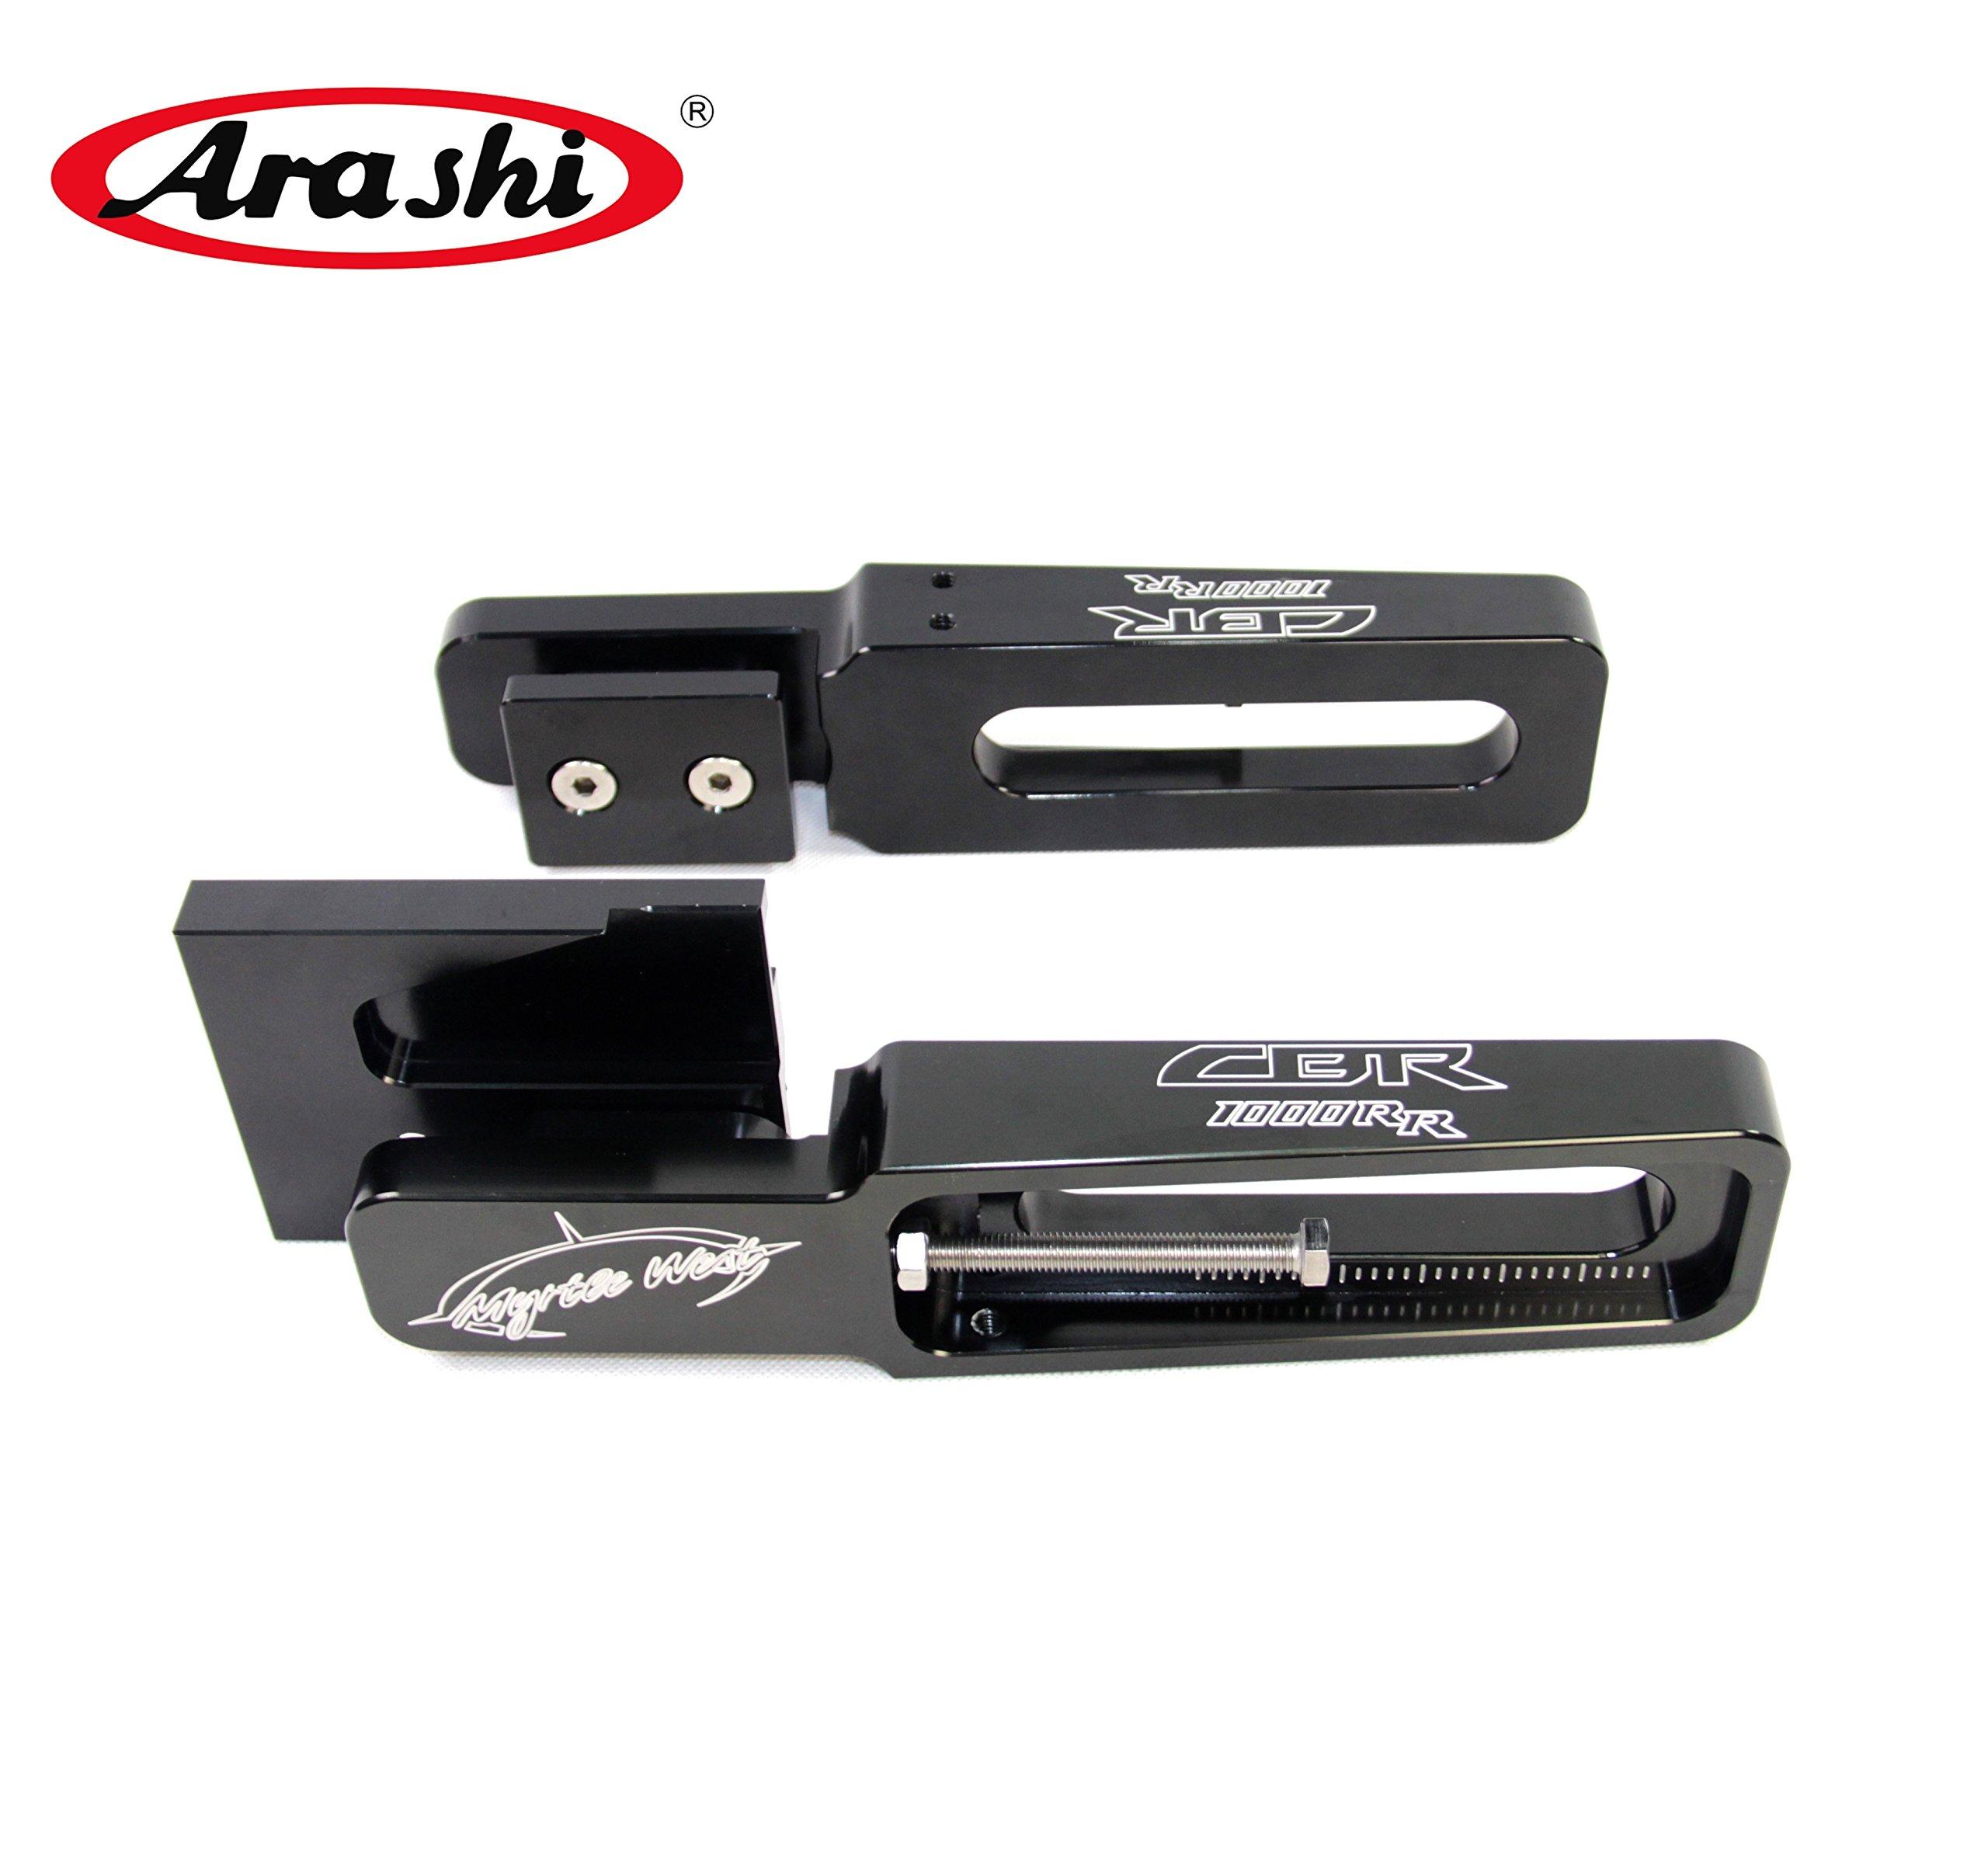 Arashi Swingarm Extended Kit Swing Arm Extension for Honda CBR1000RR by Arashi (Image #2)